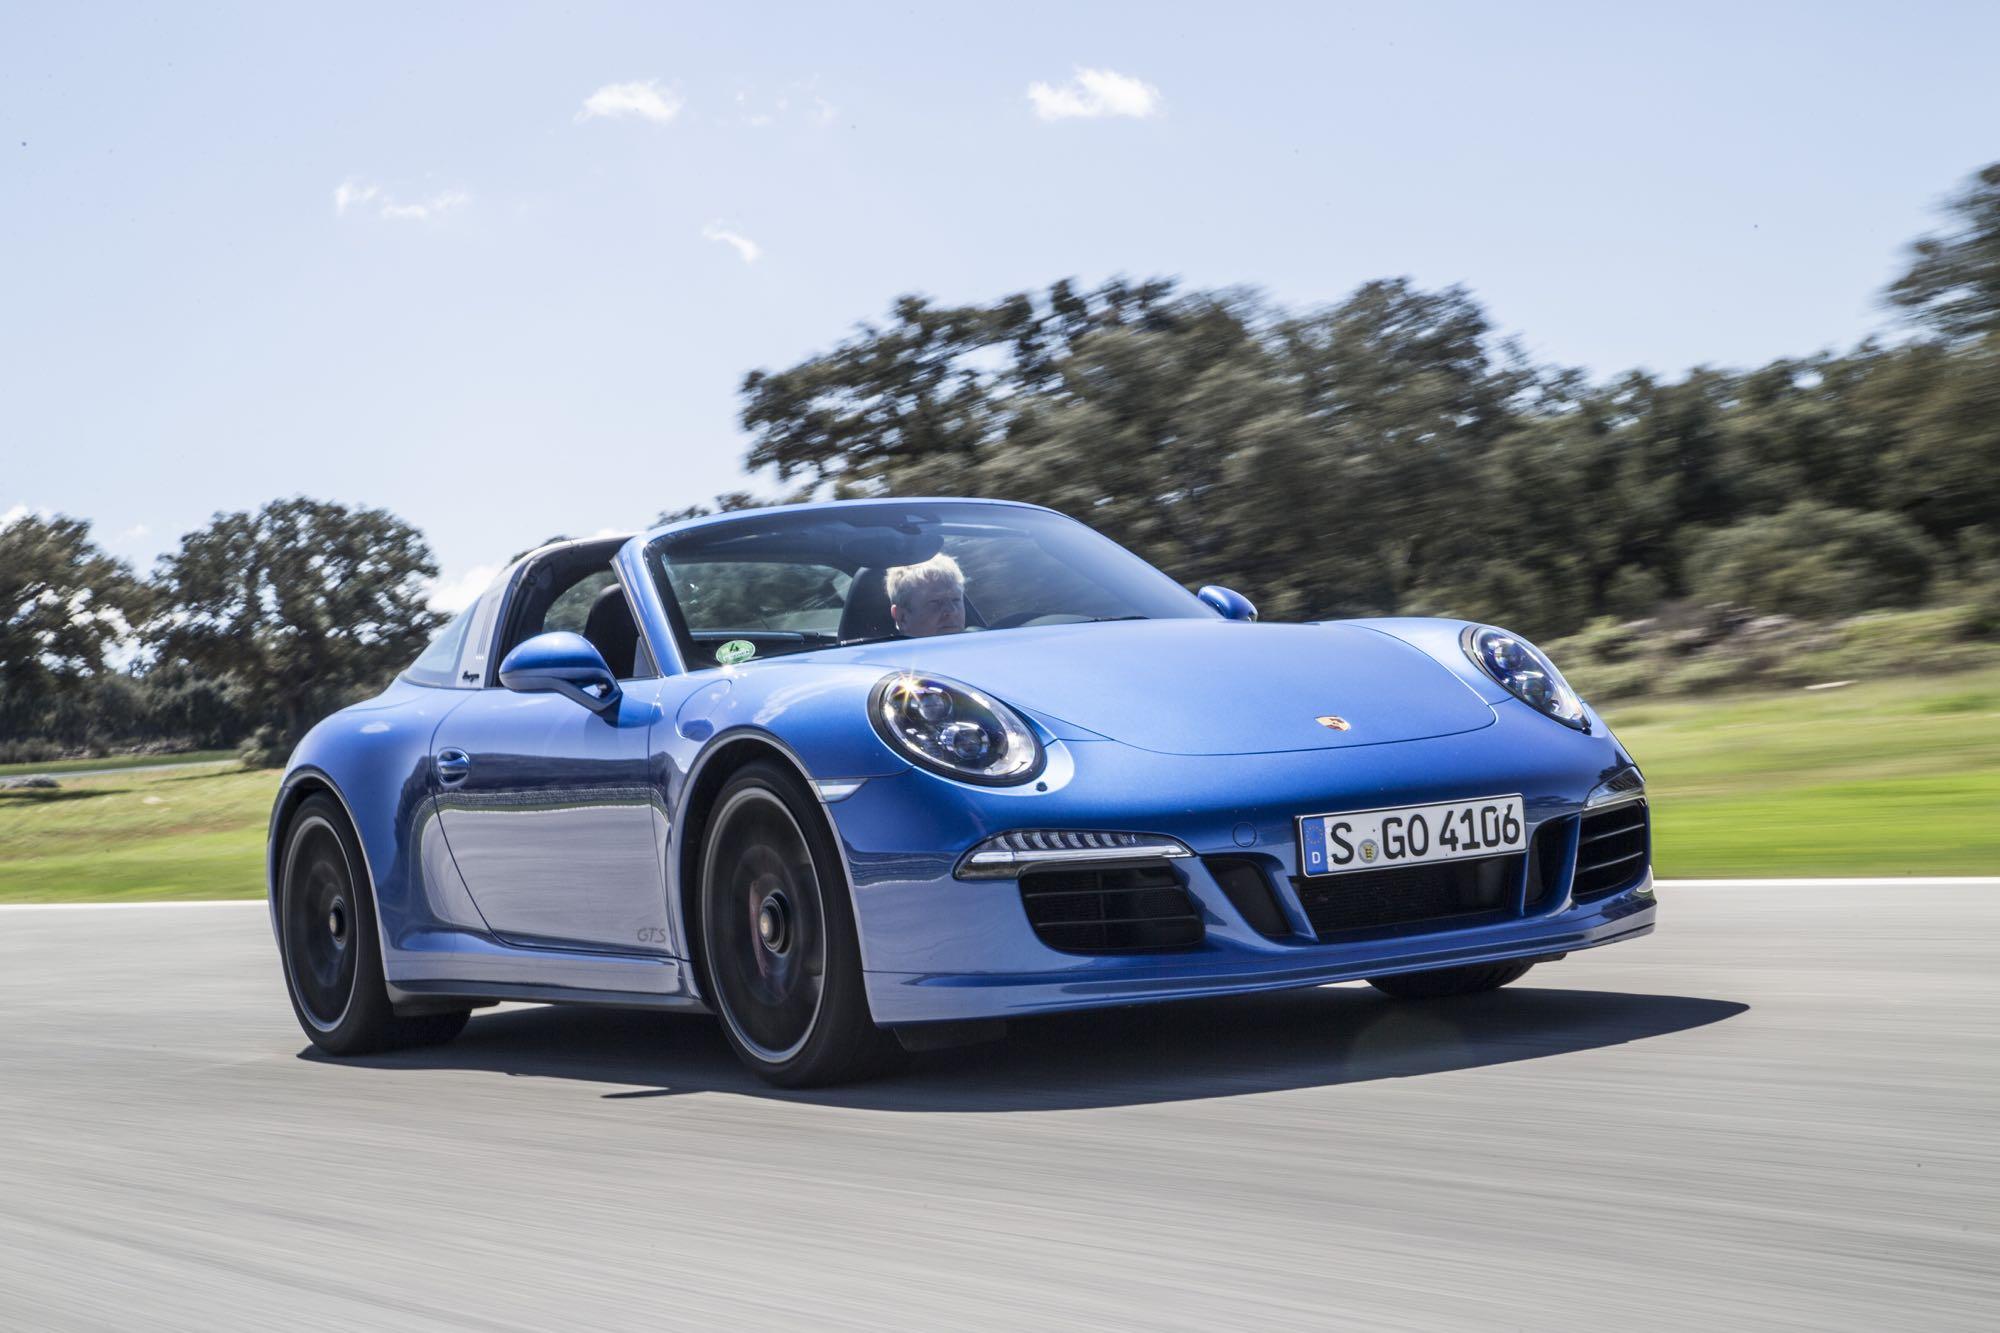 Porsche Driving School >> 2015 Porsche 911 Targa 4 GTS Review | CarAdvice